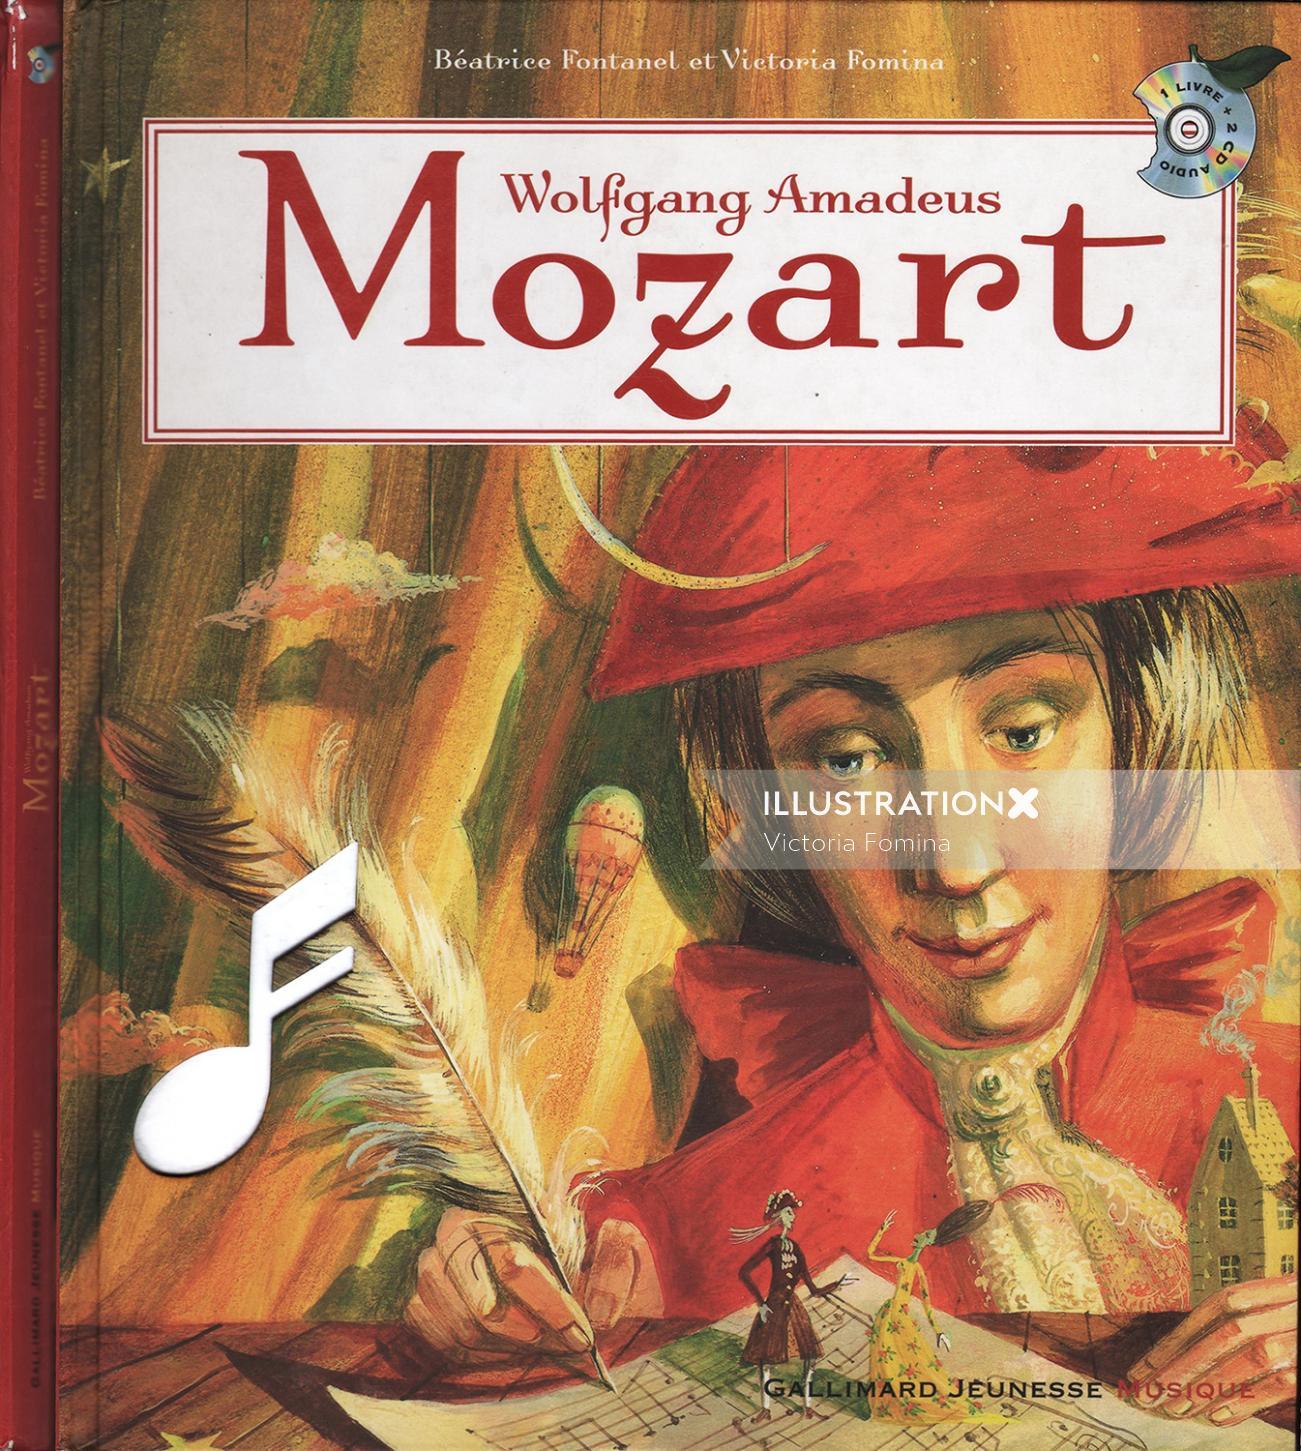 Book cover design of Mozart